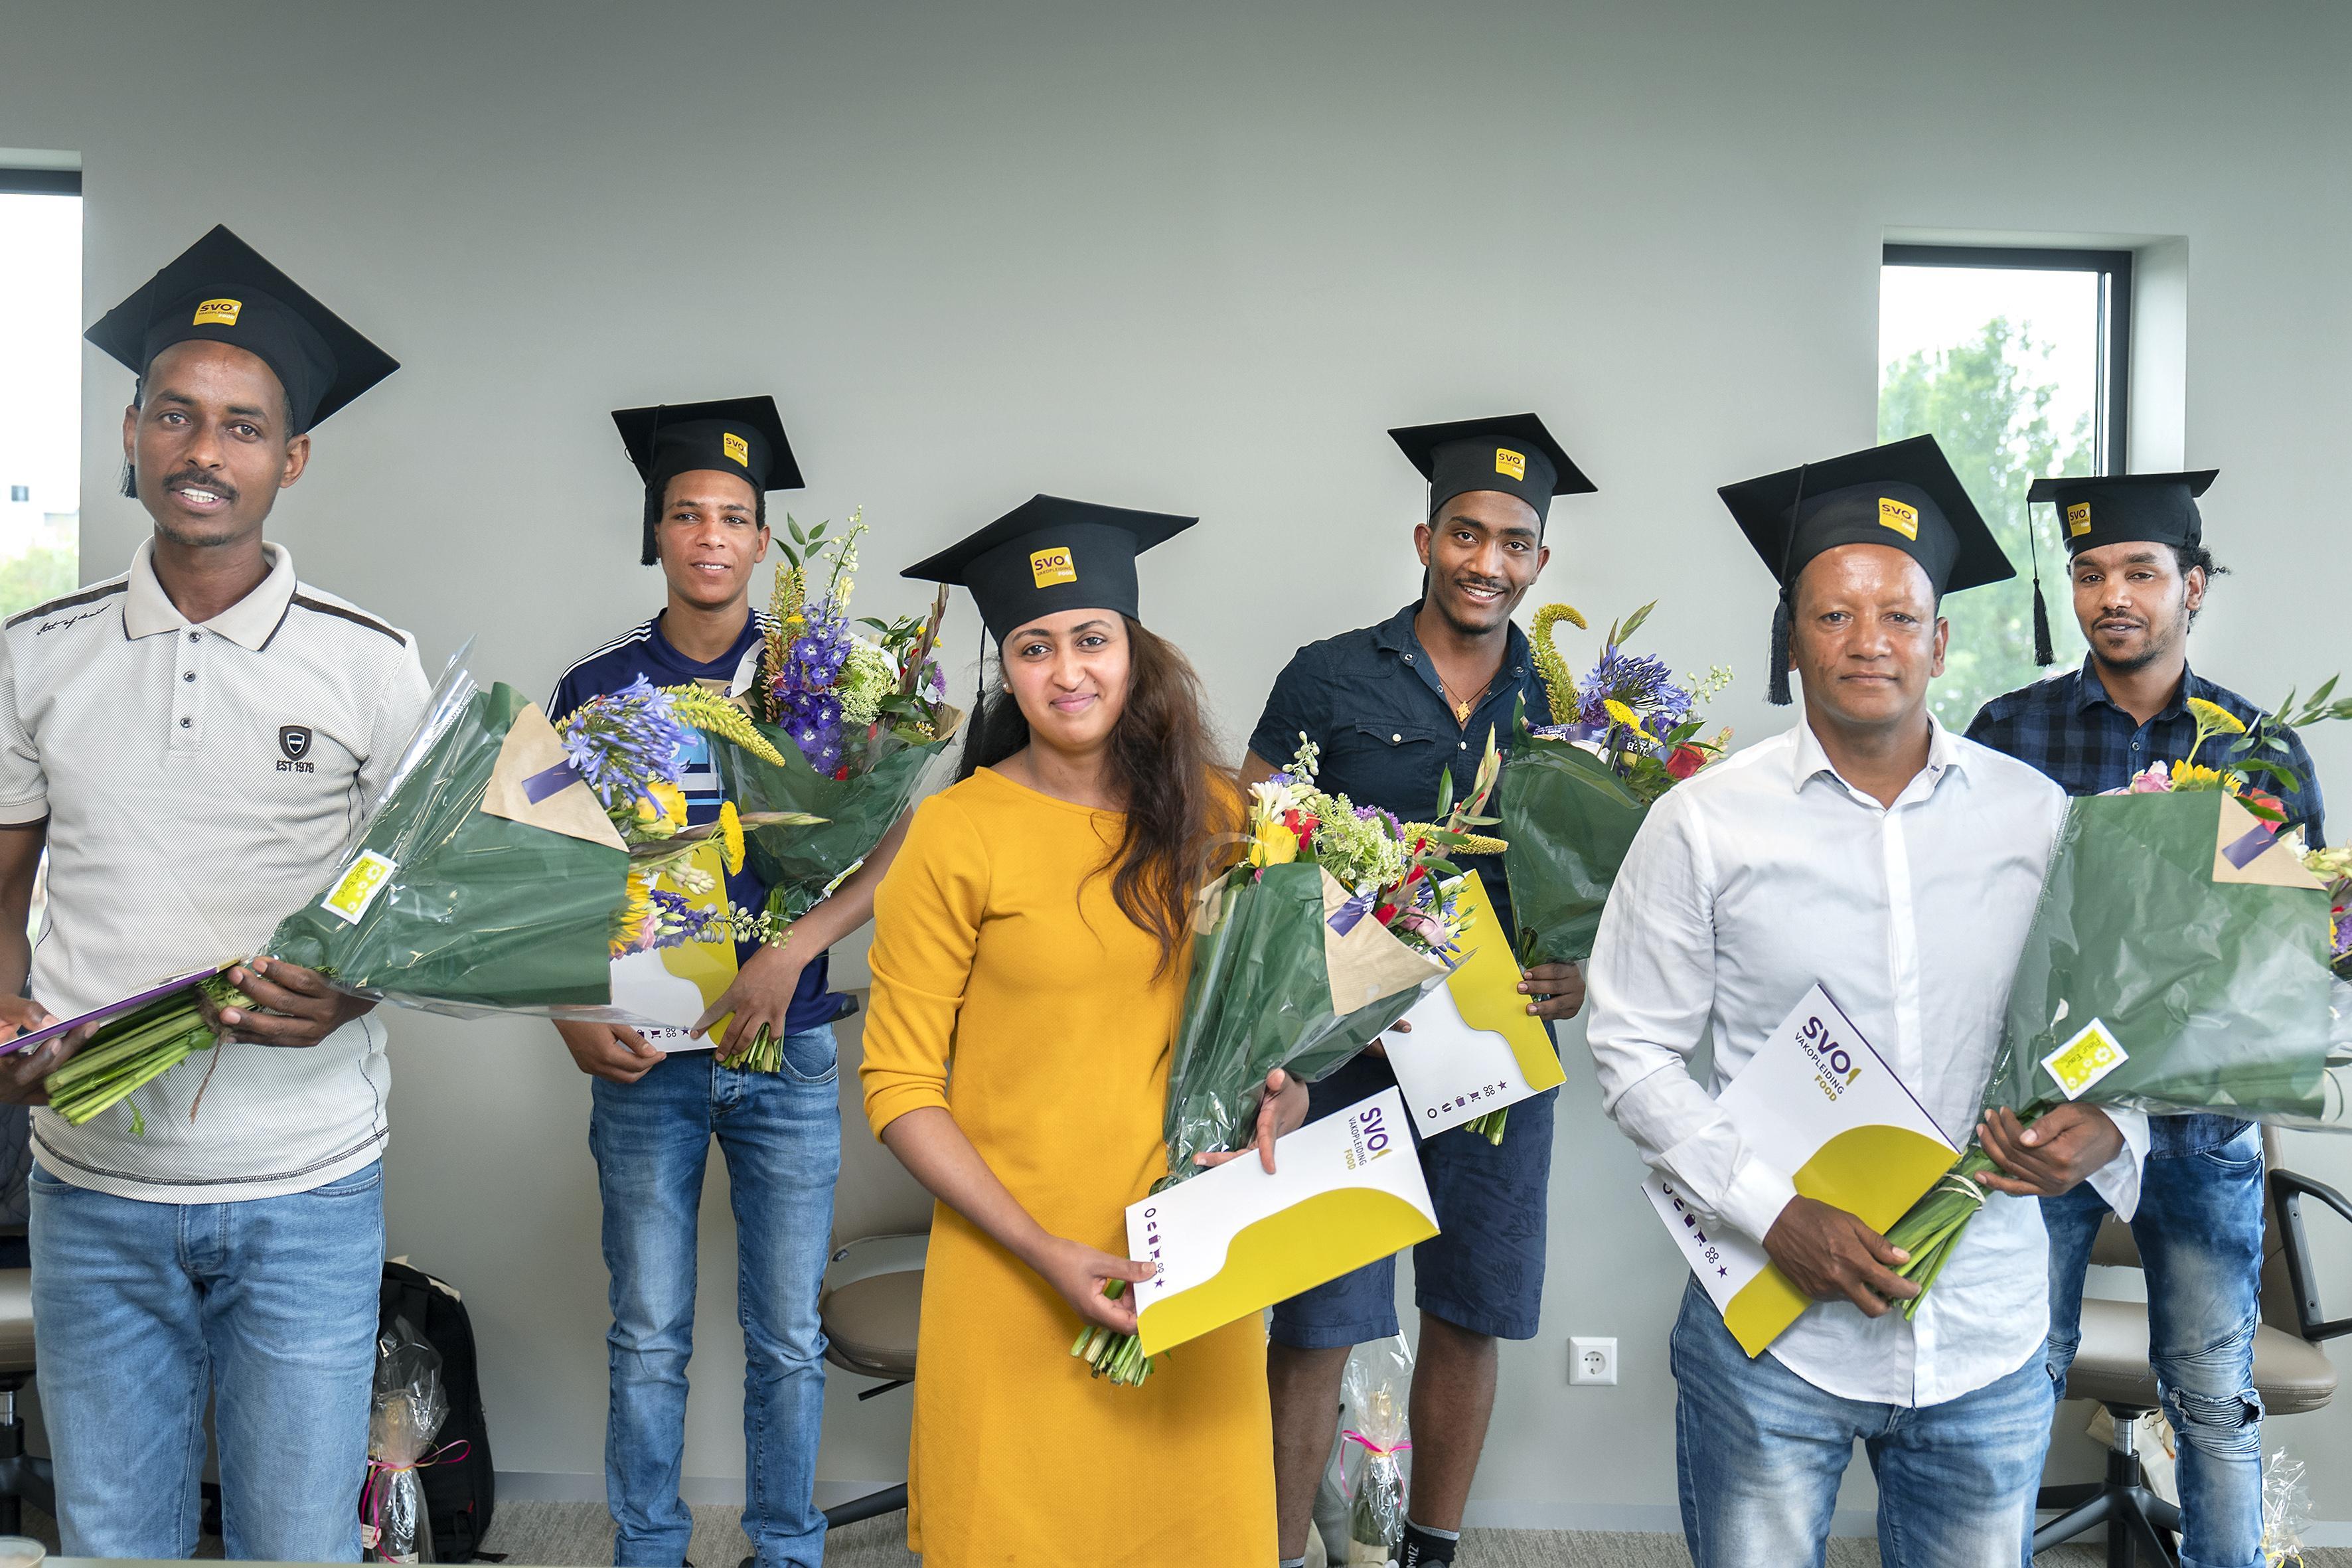 Glunderende statushouders ontvangen in Haarlem 'medewerker voedingsindustrie'-diploma bij spekjesfabriek